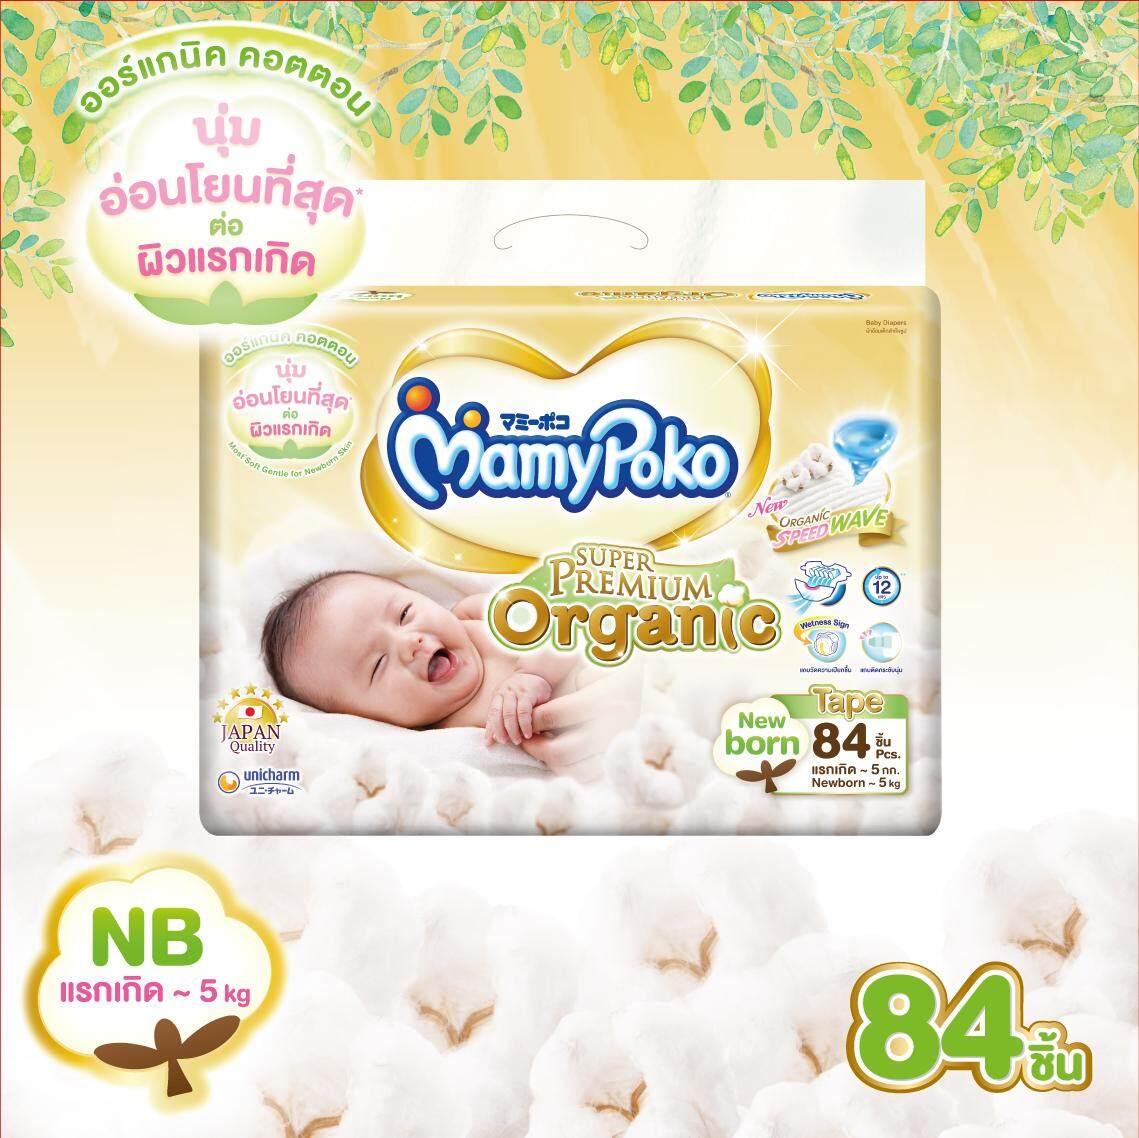 MamyPoko Super Premium Organic ผ้าอ้อมเด็กแบบเทป มามี่โพโค มามี่โพโค ซุปเปอร์ พรีเมี่ยม ออร์แกนิค ไซส์ New born (แรกเกิด) จำนวน 84 ชิ้น